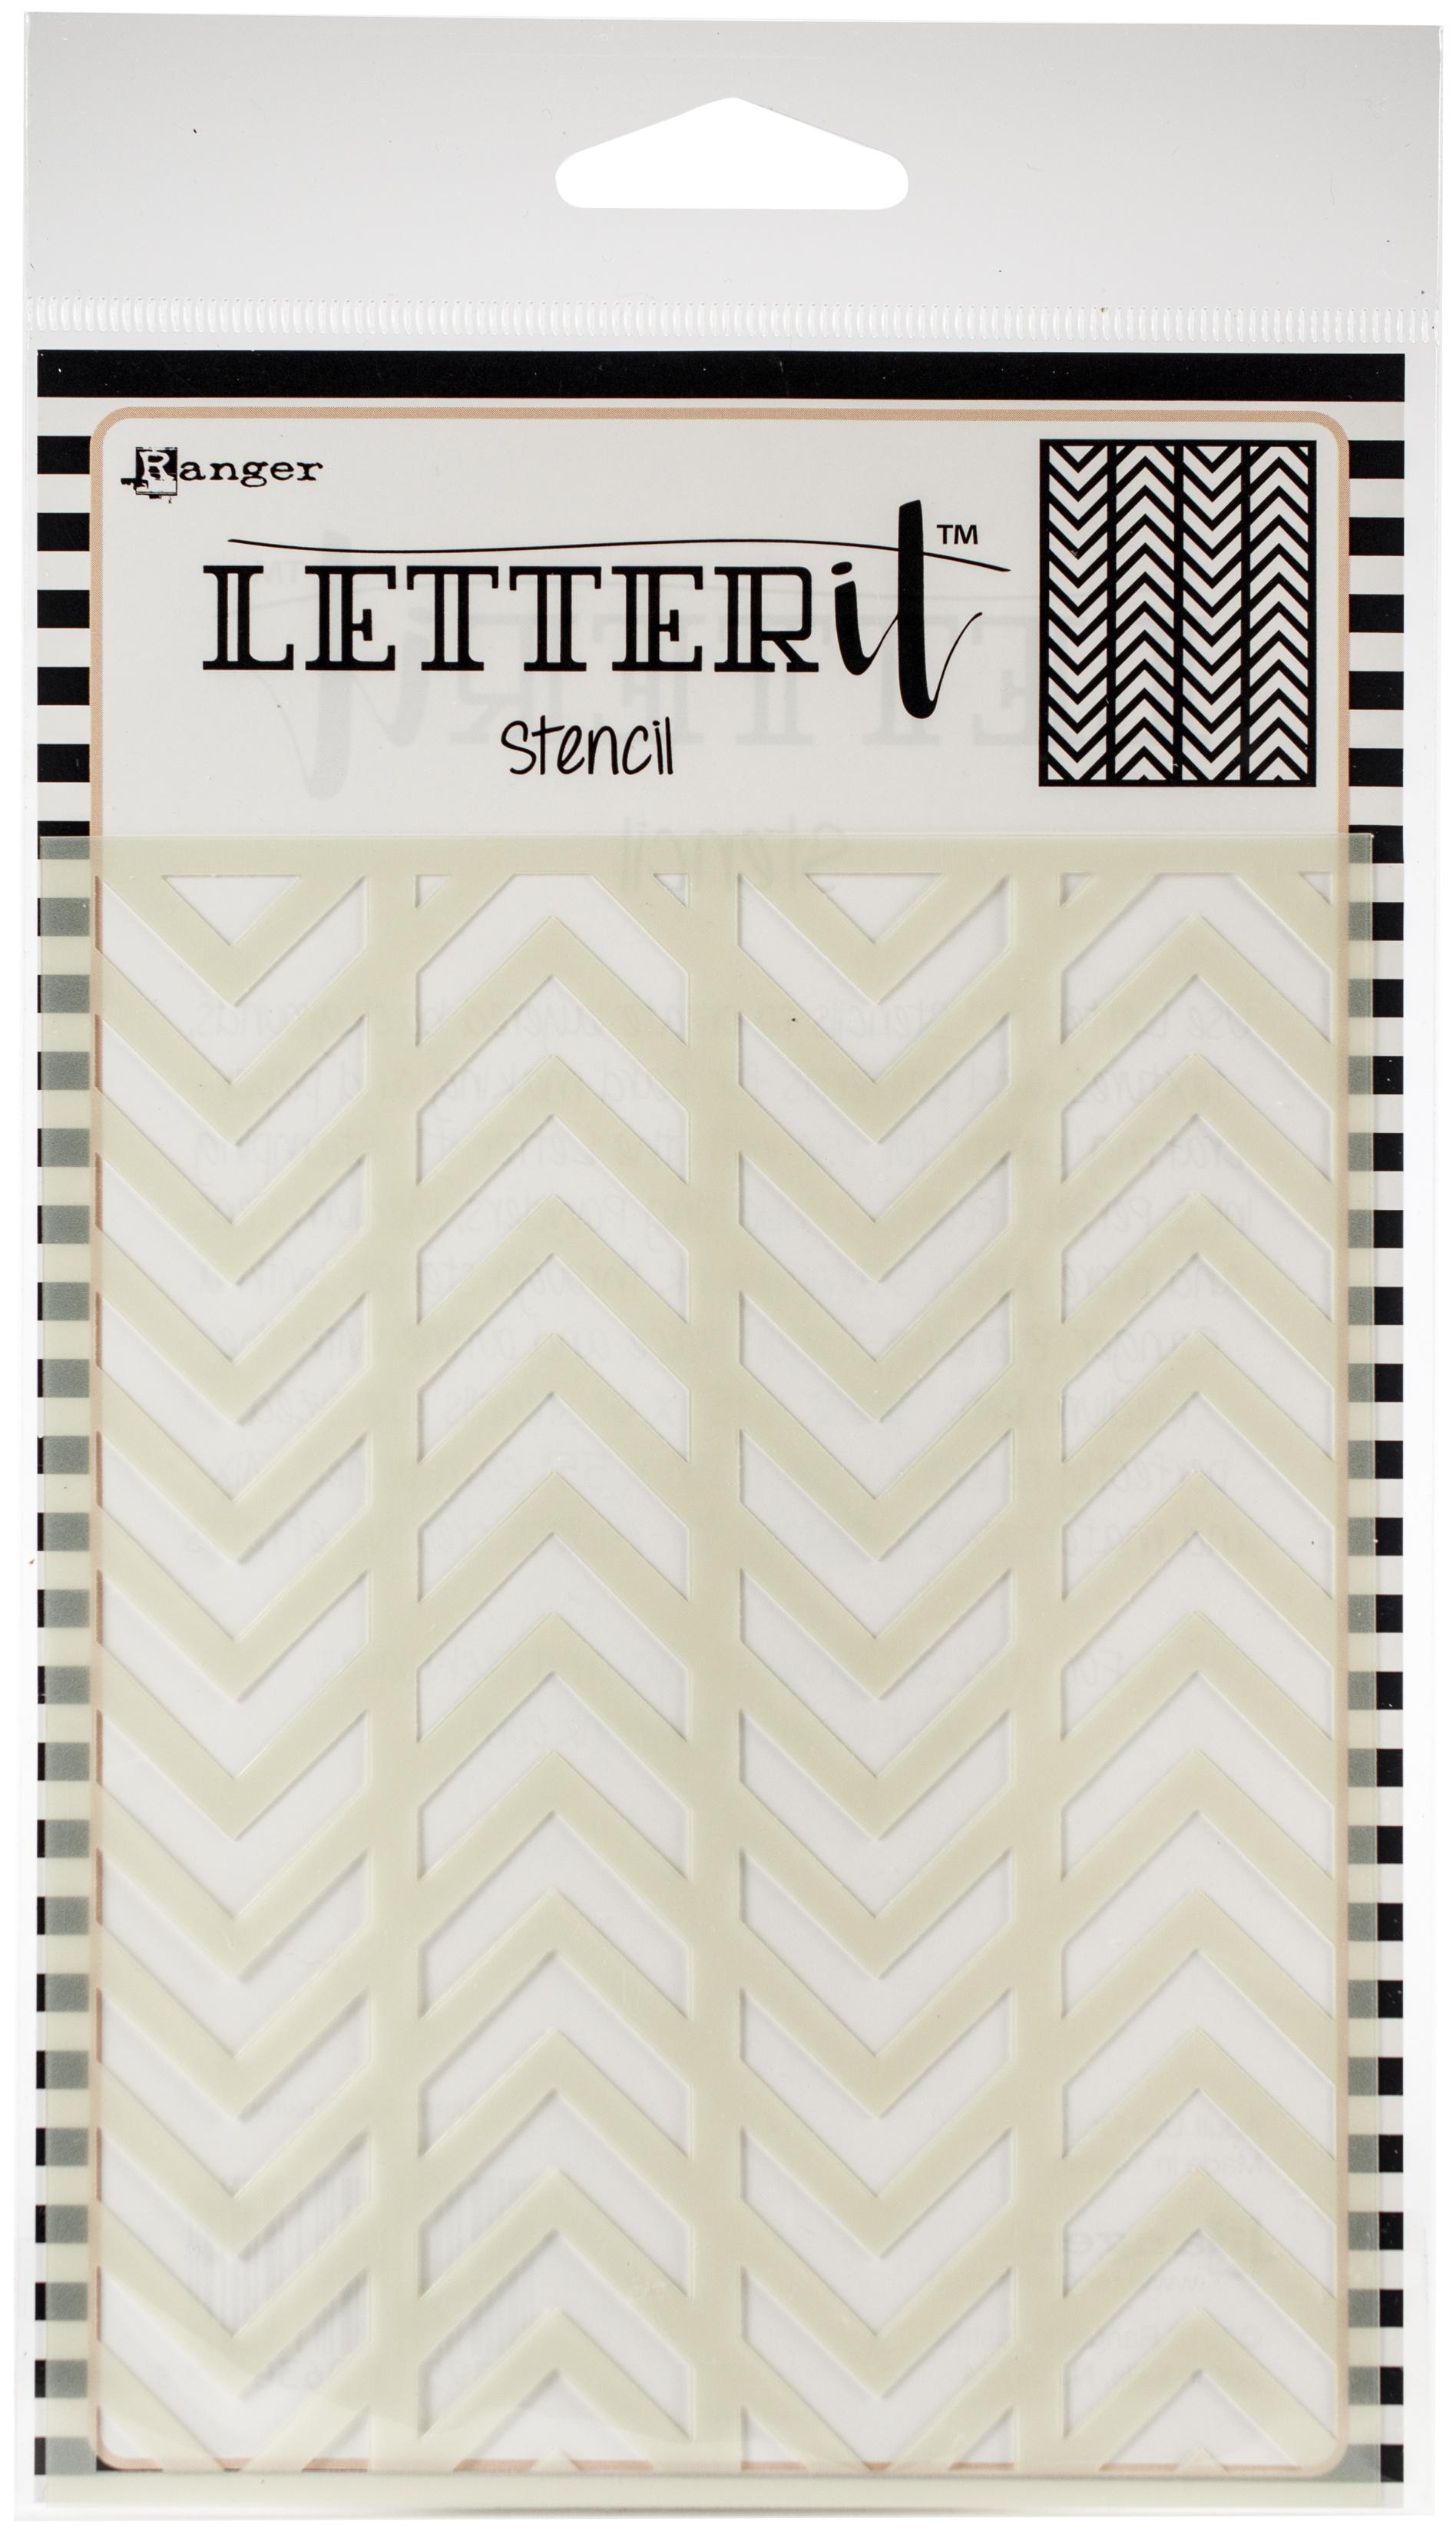 Ranger Letter It Background Stencil 4.75X6-Alternating Chevrons